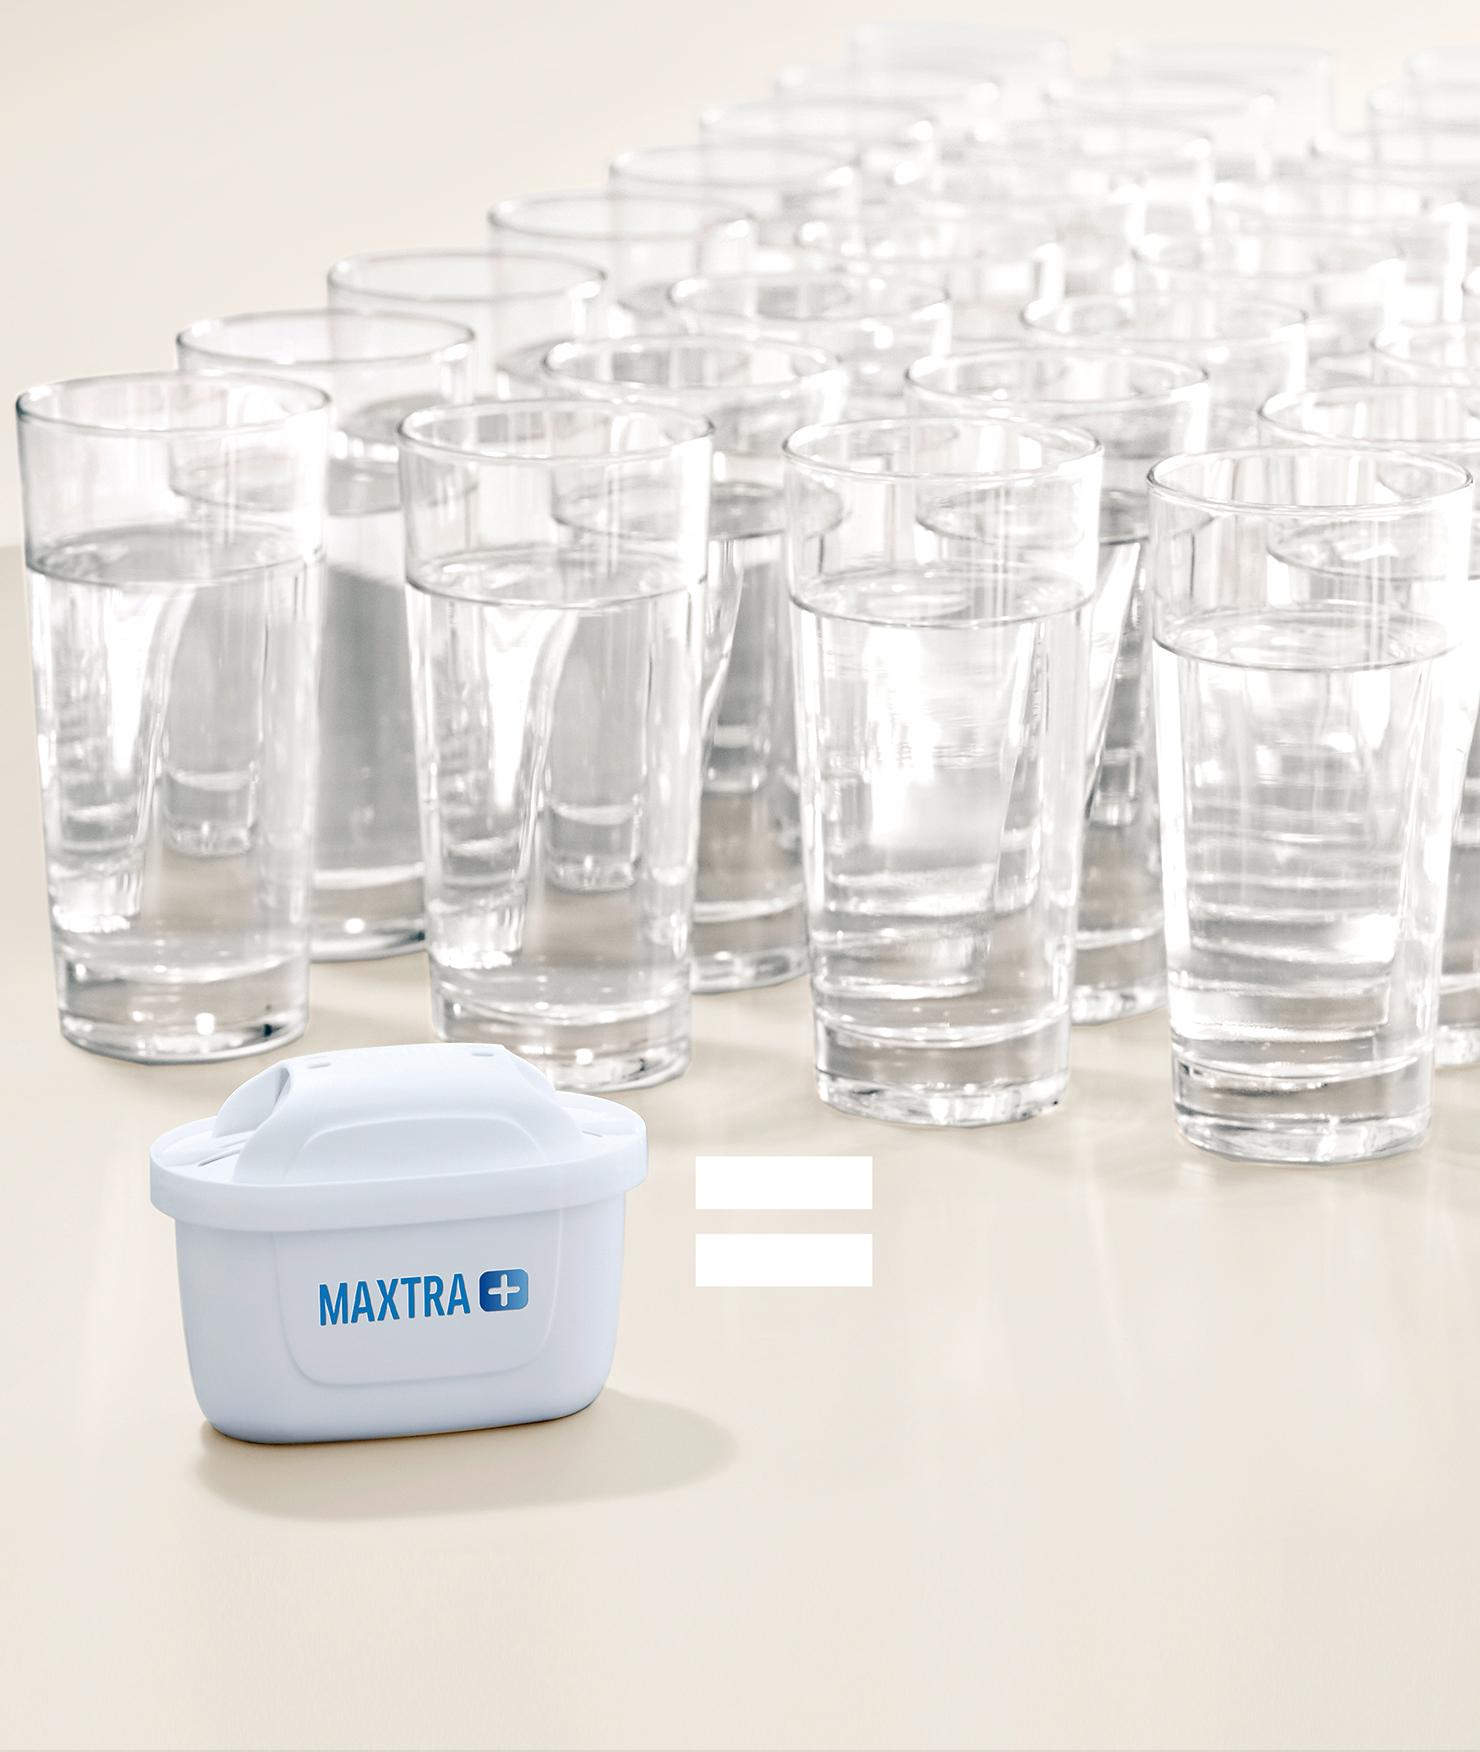 BRITA filters & cartridges MAXTRA+